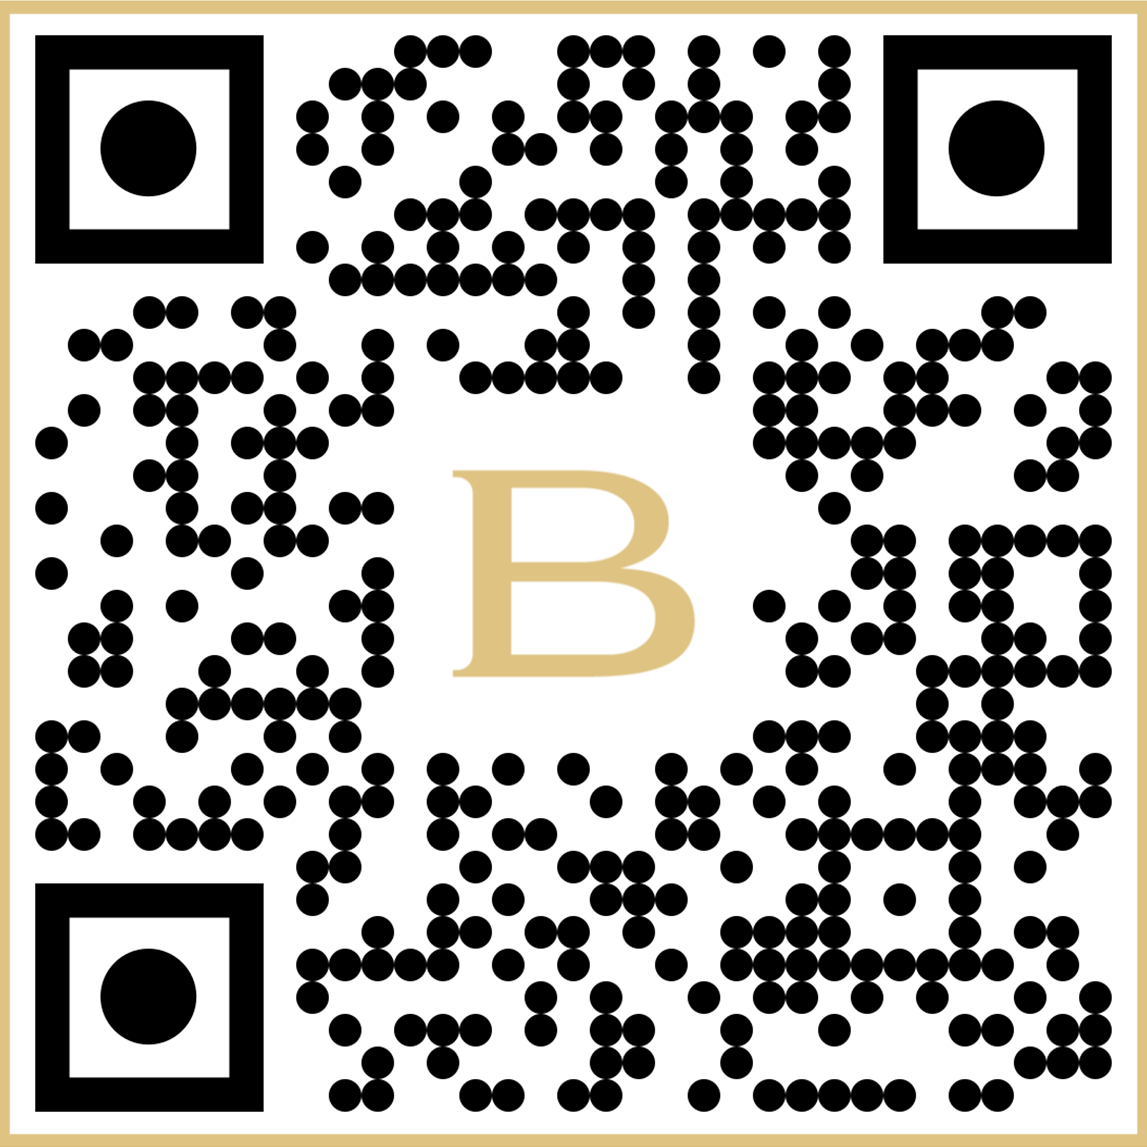 BVLGARI Allegra Content Visual 5